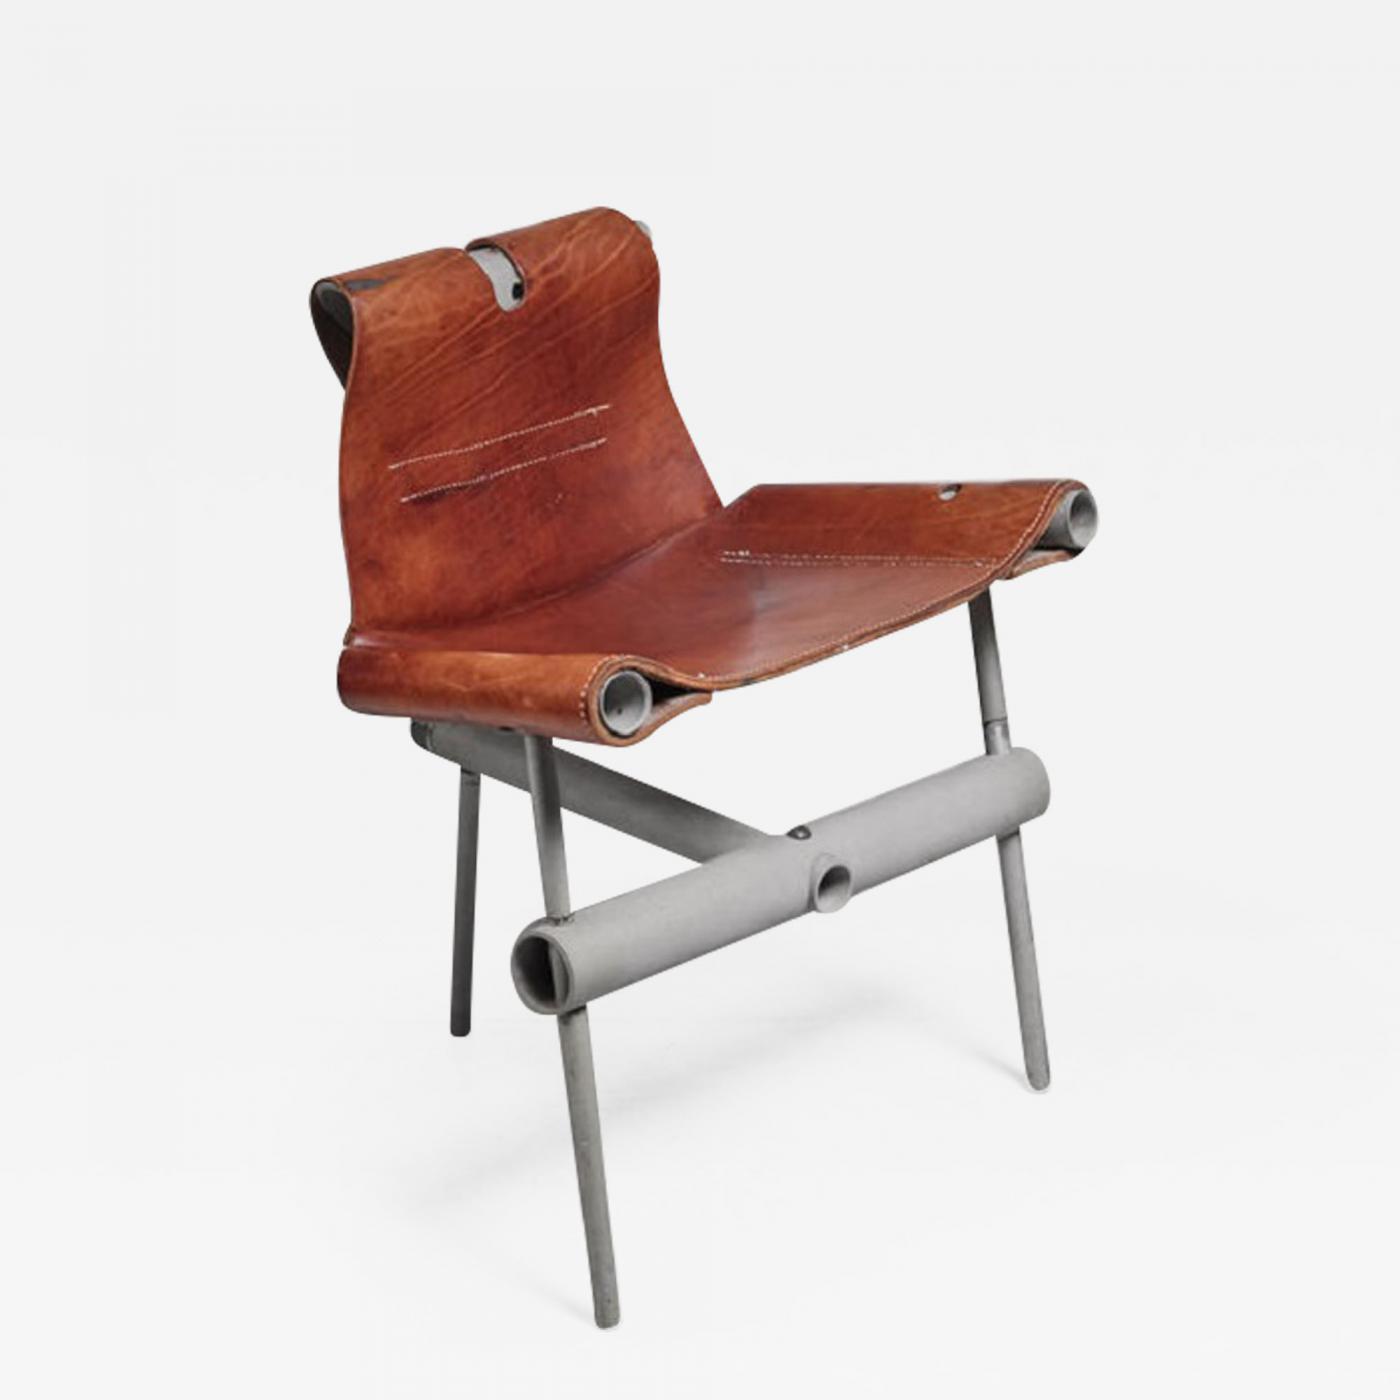 Max Gottschalk Prototype Leather Sling Chair Usa 1960s